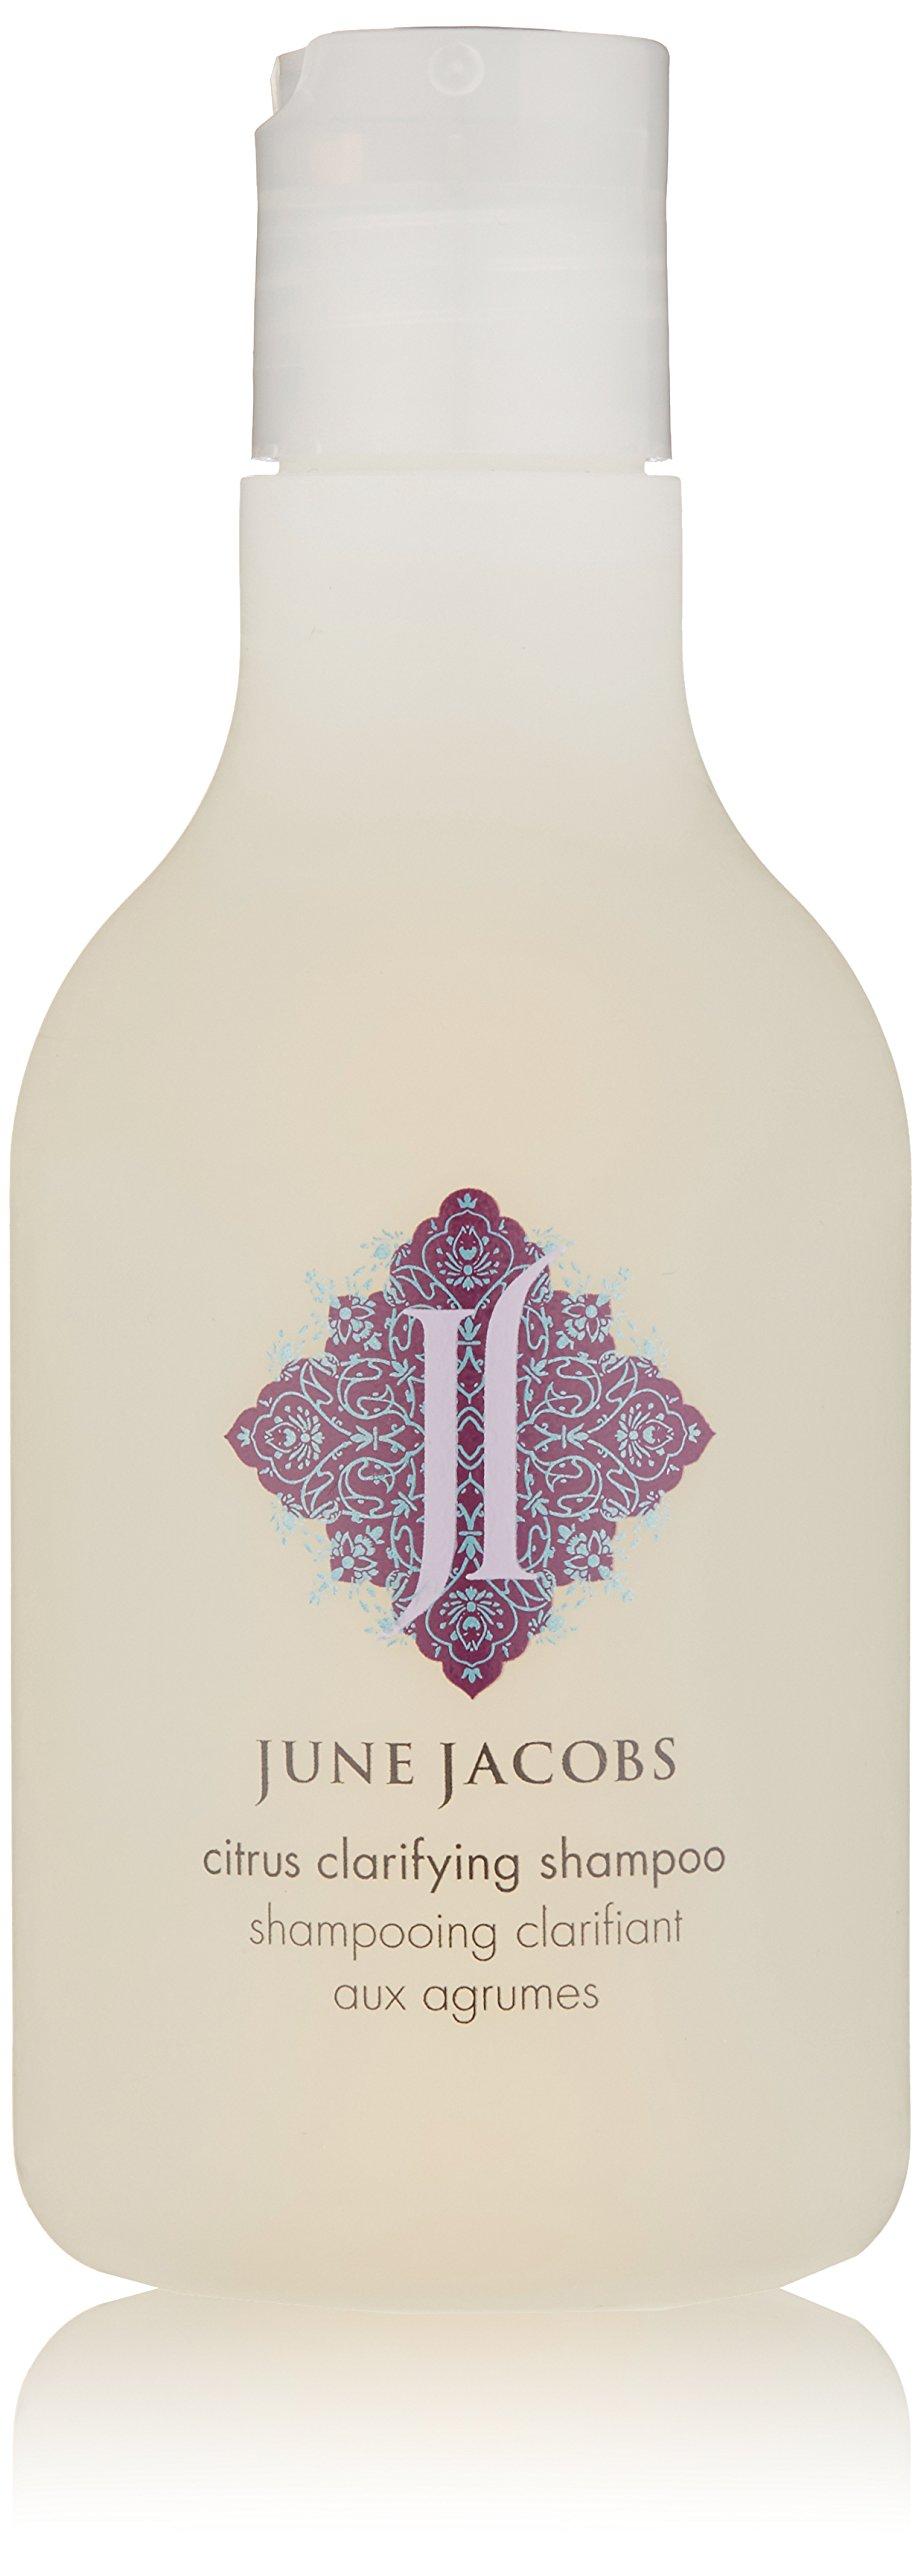 June Jacobs Citrus Clarifying Shampoo, 6.7 fl.oz.